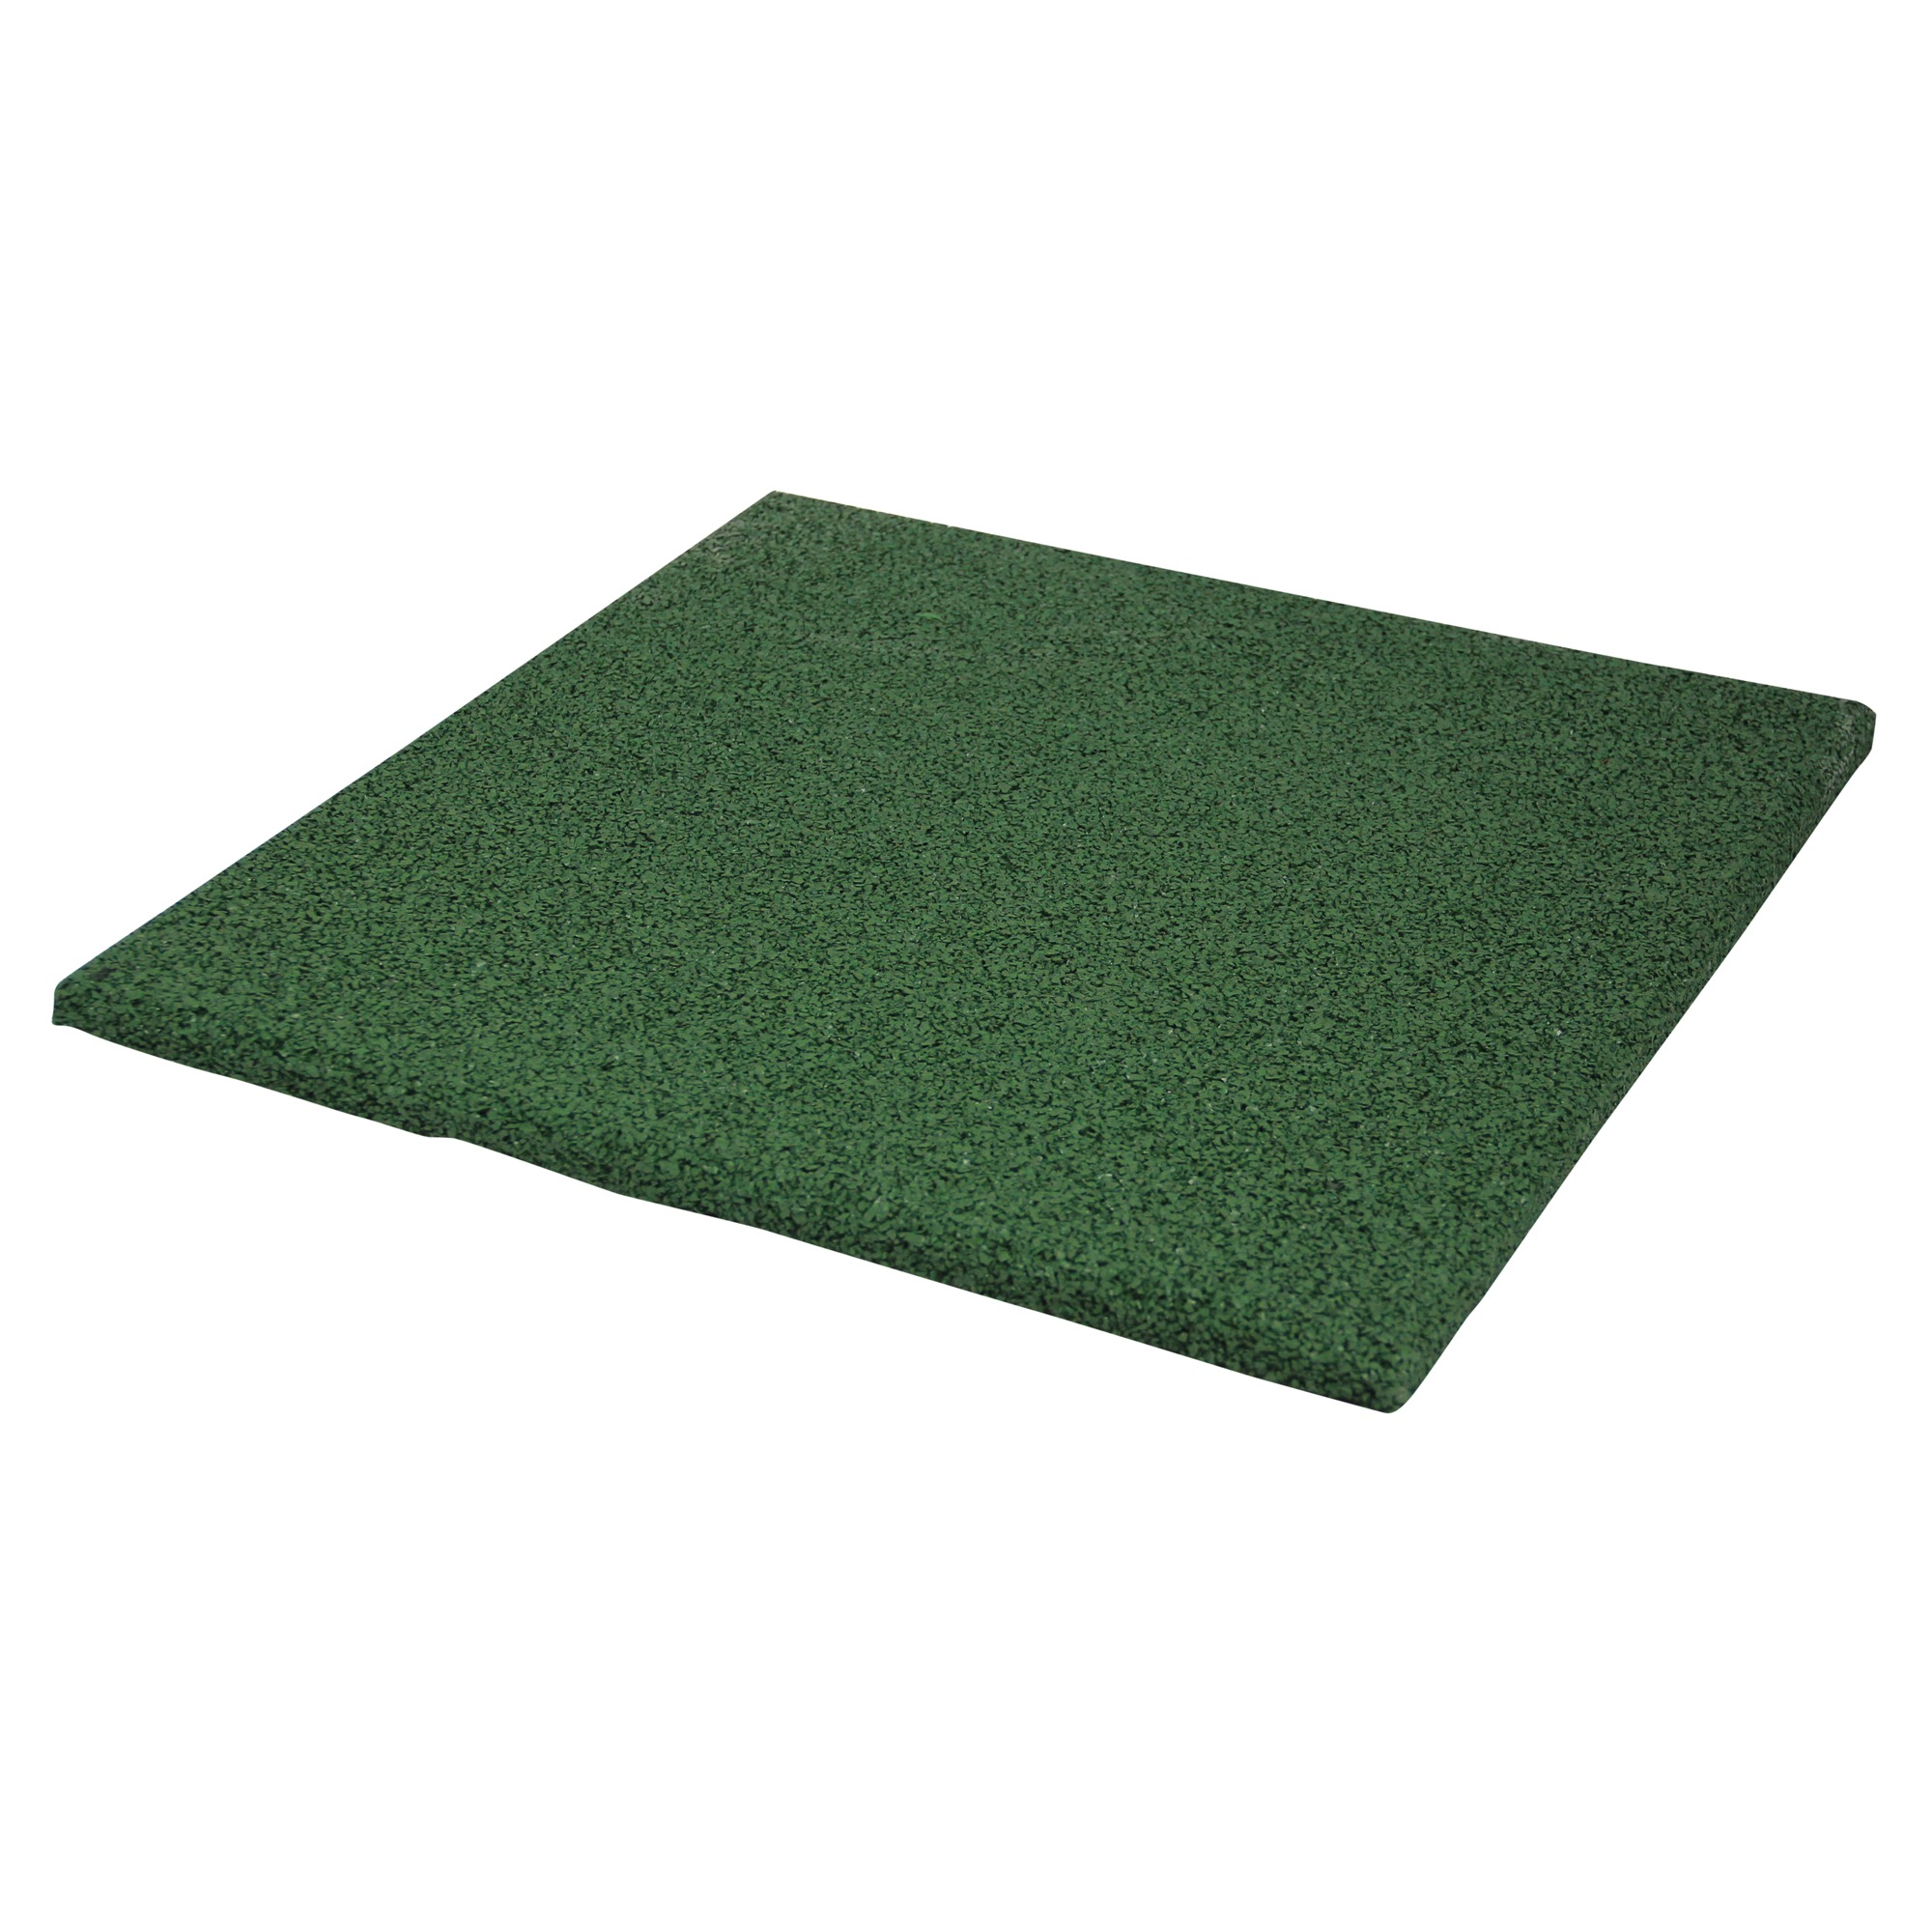 Terrastegel Rubber Groen 40x40 cm - 40 Tegels - 6,40 m2